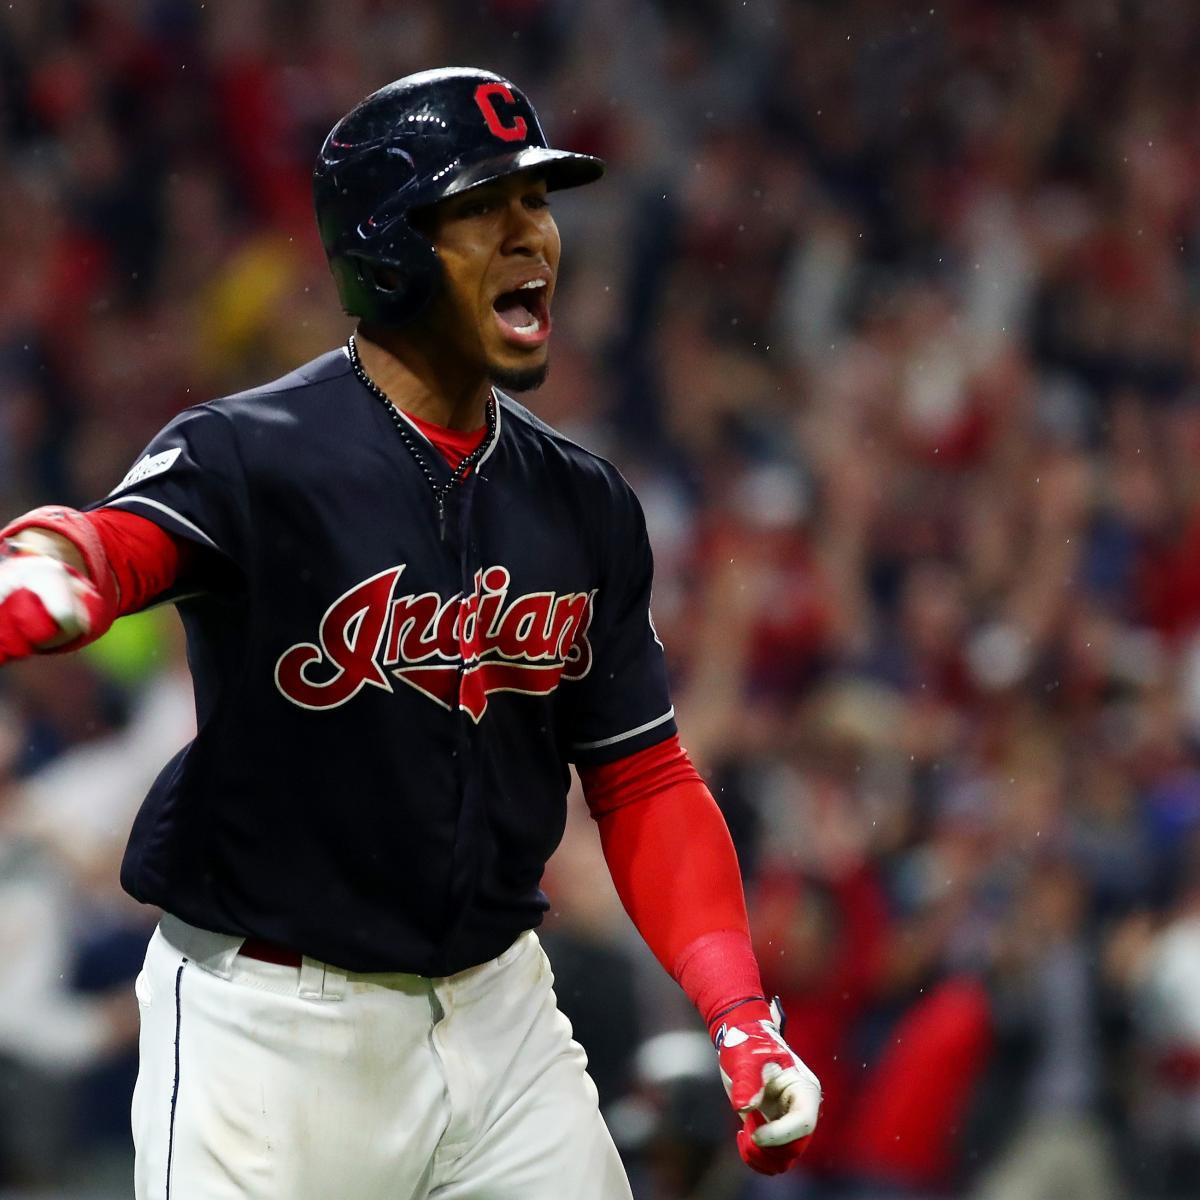 028e94d1d Ranking MLB s 25 Best Players Under 25 Entering the 2018 Season ...